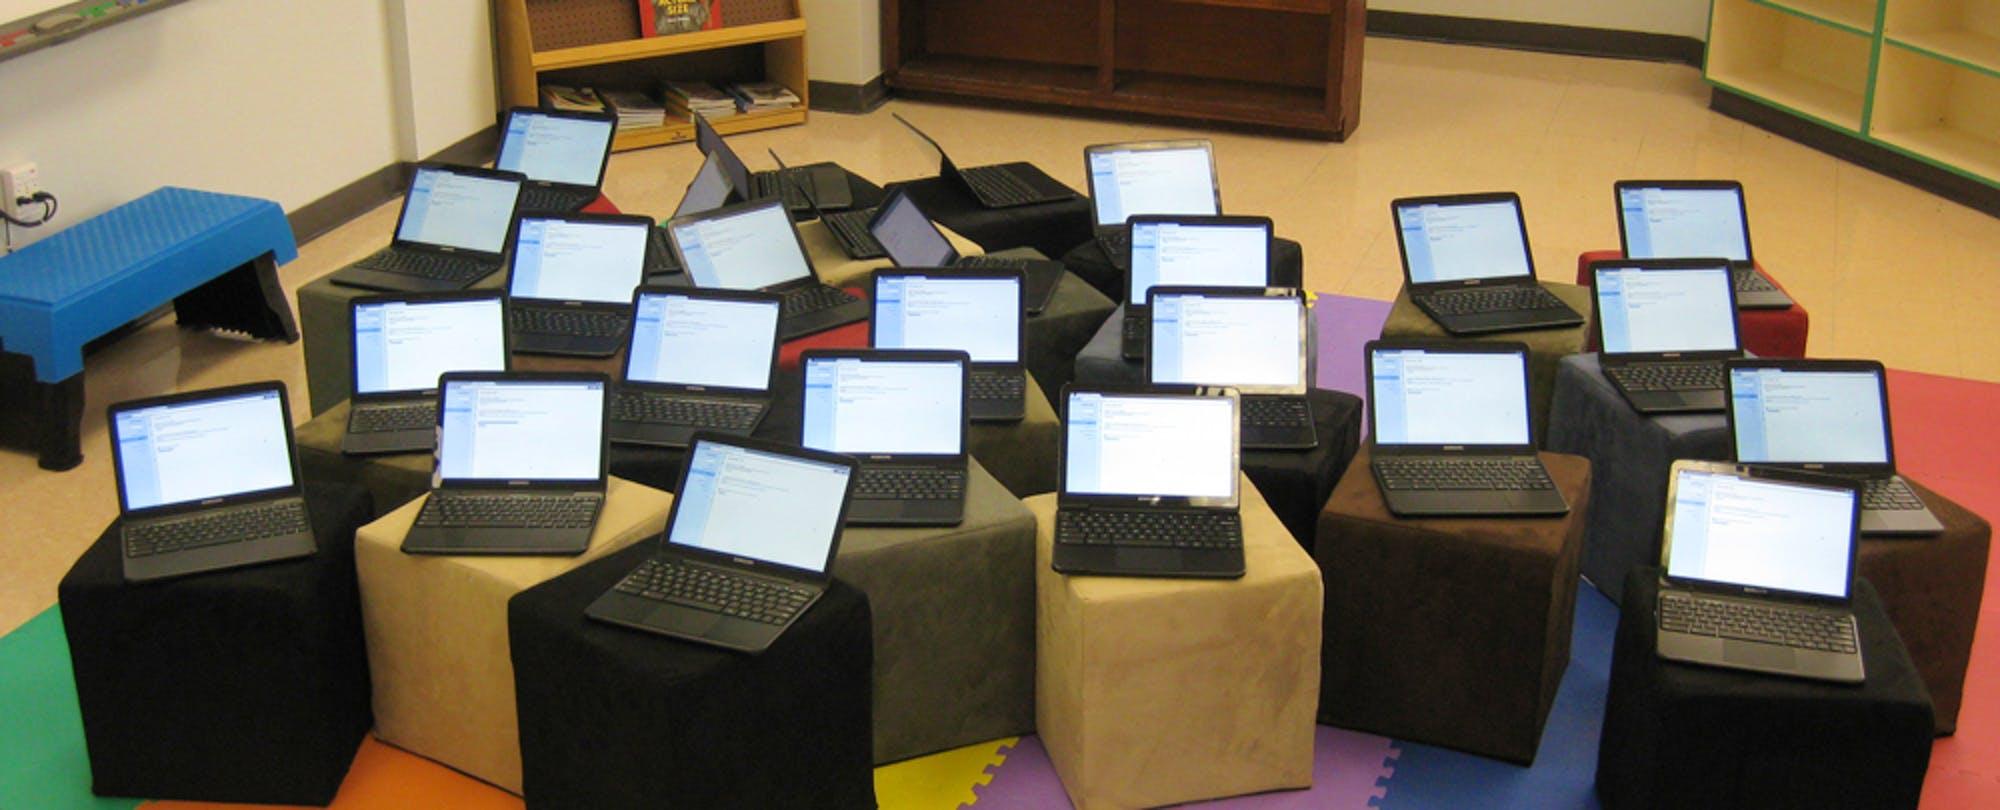 Google Chromebooks Make Up Nearly Half of All US K-12 Device Sales